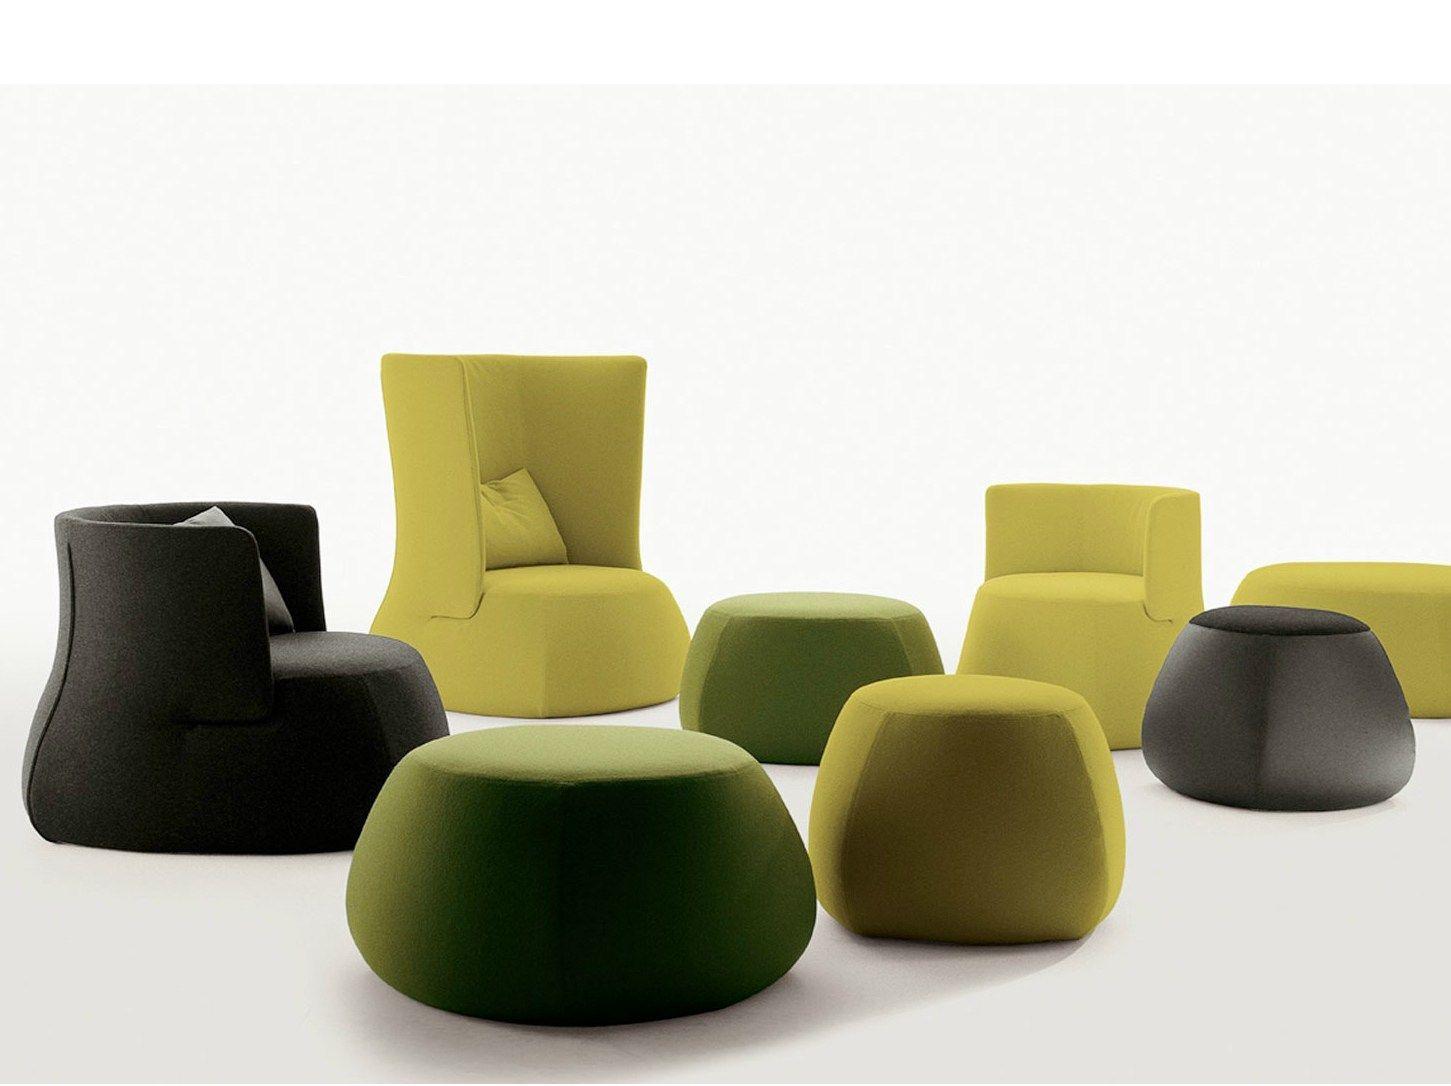 Fat sofa pouf by b b italia design patricia urquiola - B b italia design ...